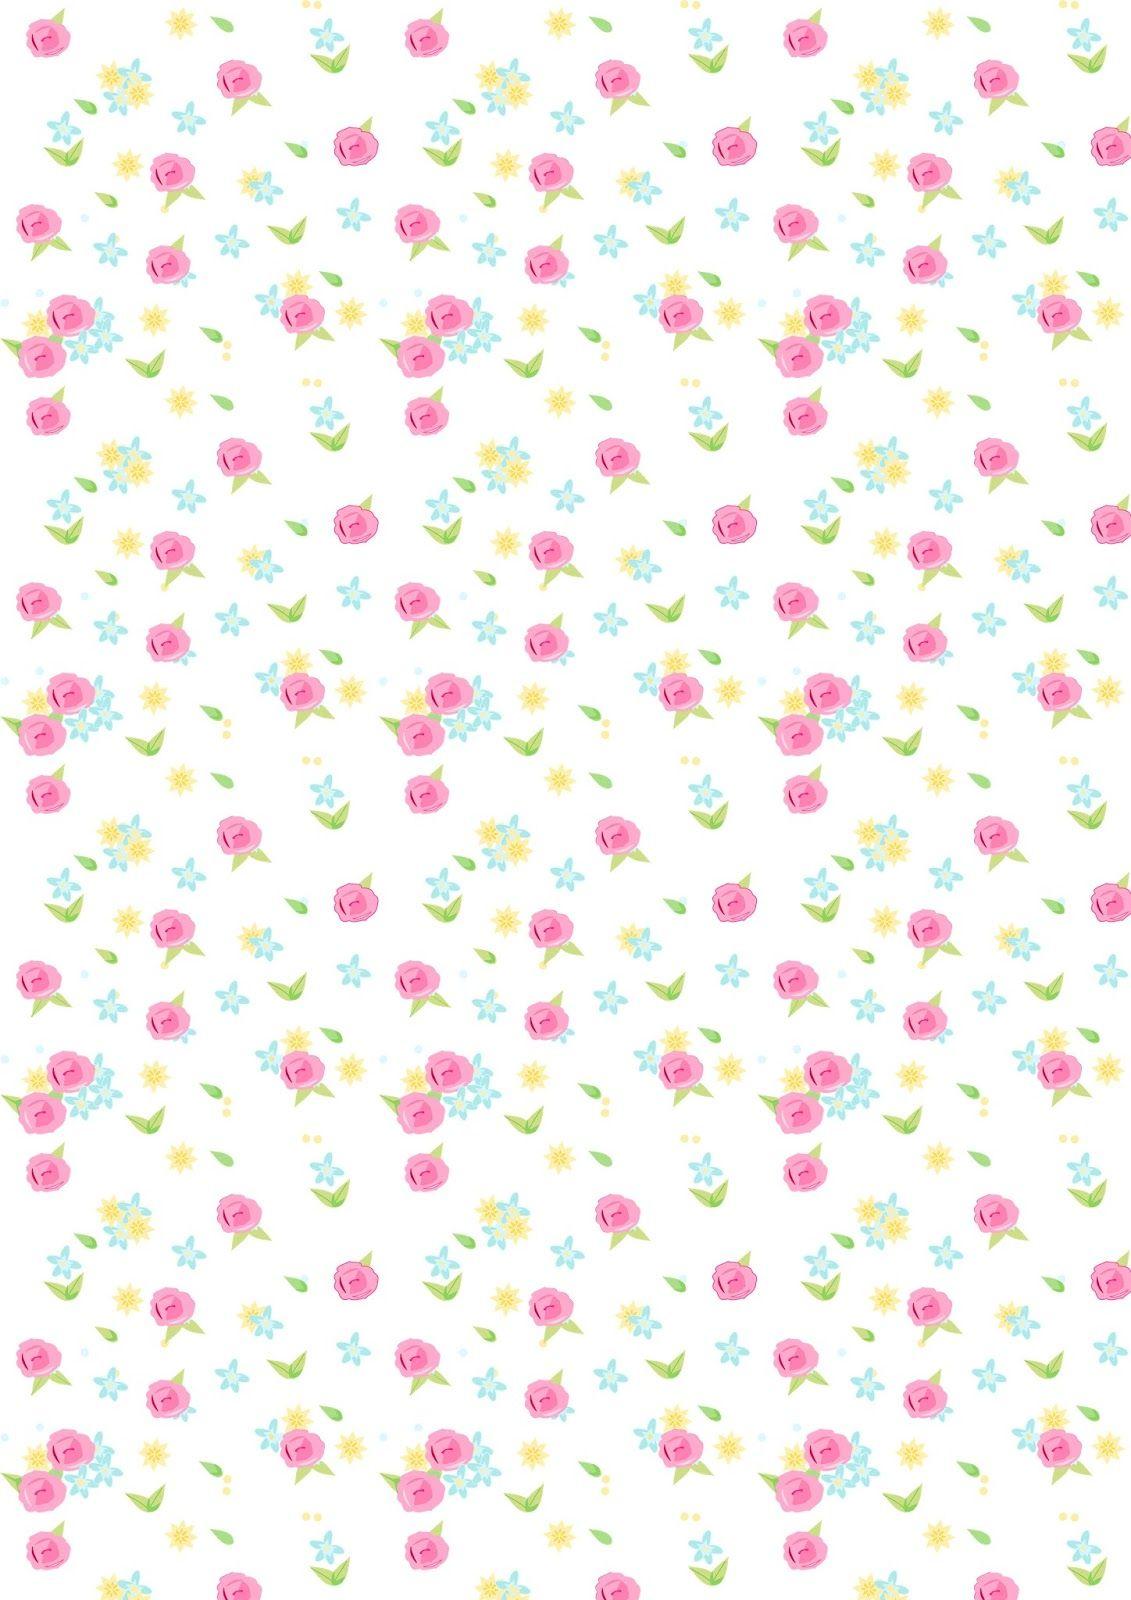 Free Digital Rose Scrapbooking Paper Ausdruckbares